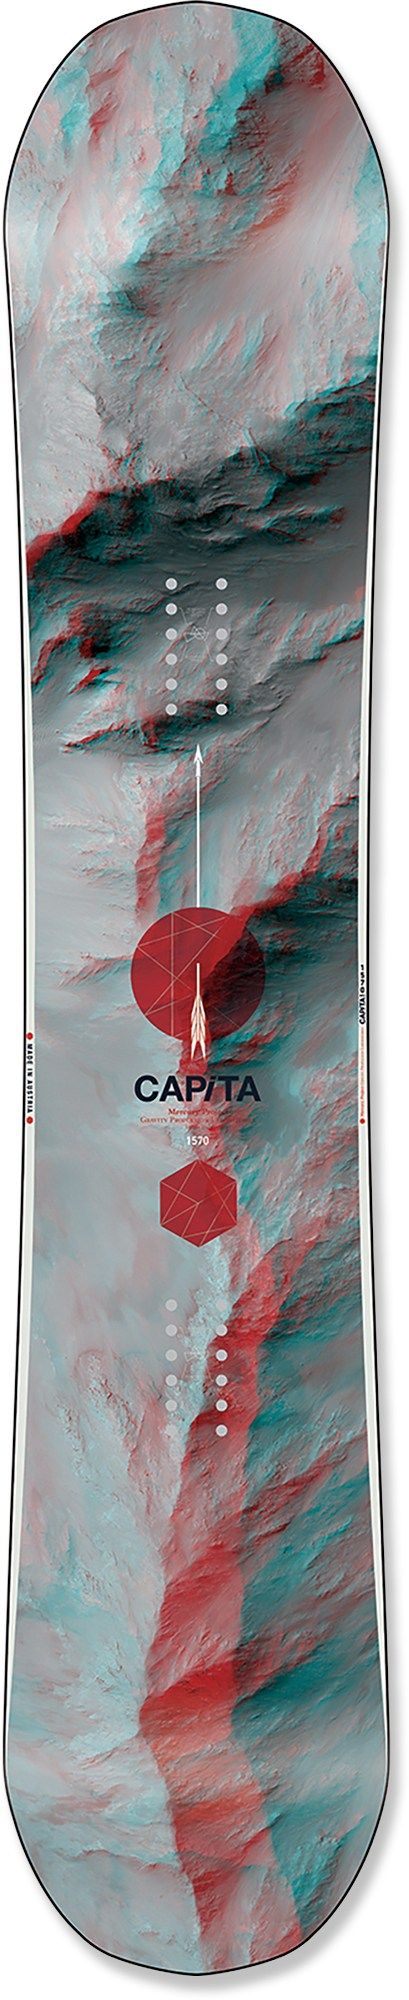 Capita Male Mercury Snowboard /2016